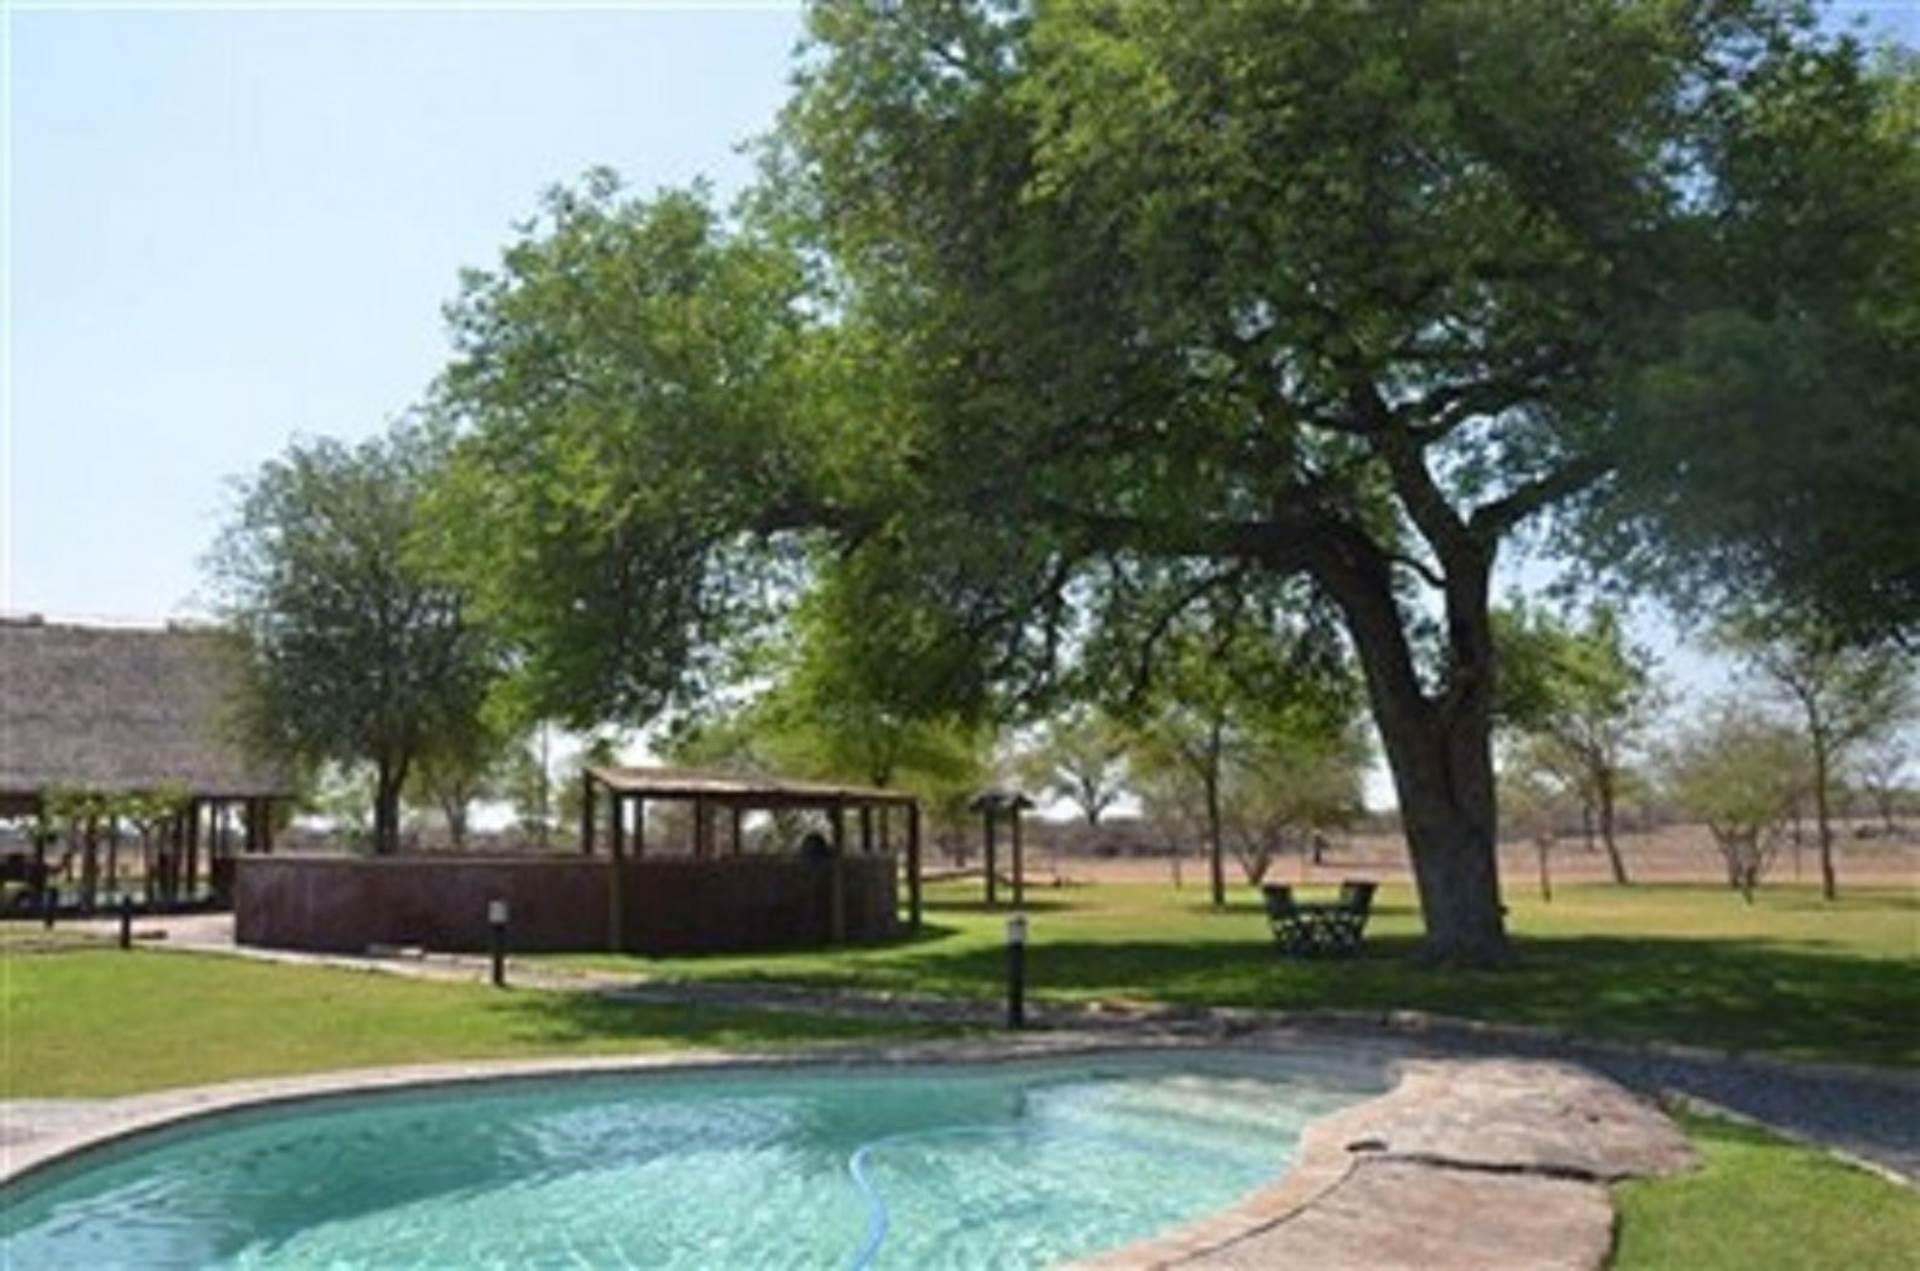 Game Farm Lodge For Sale In Thabazimbi